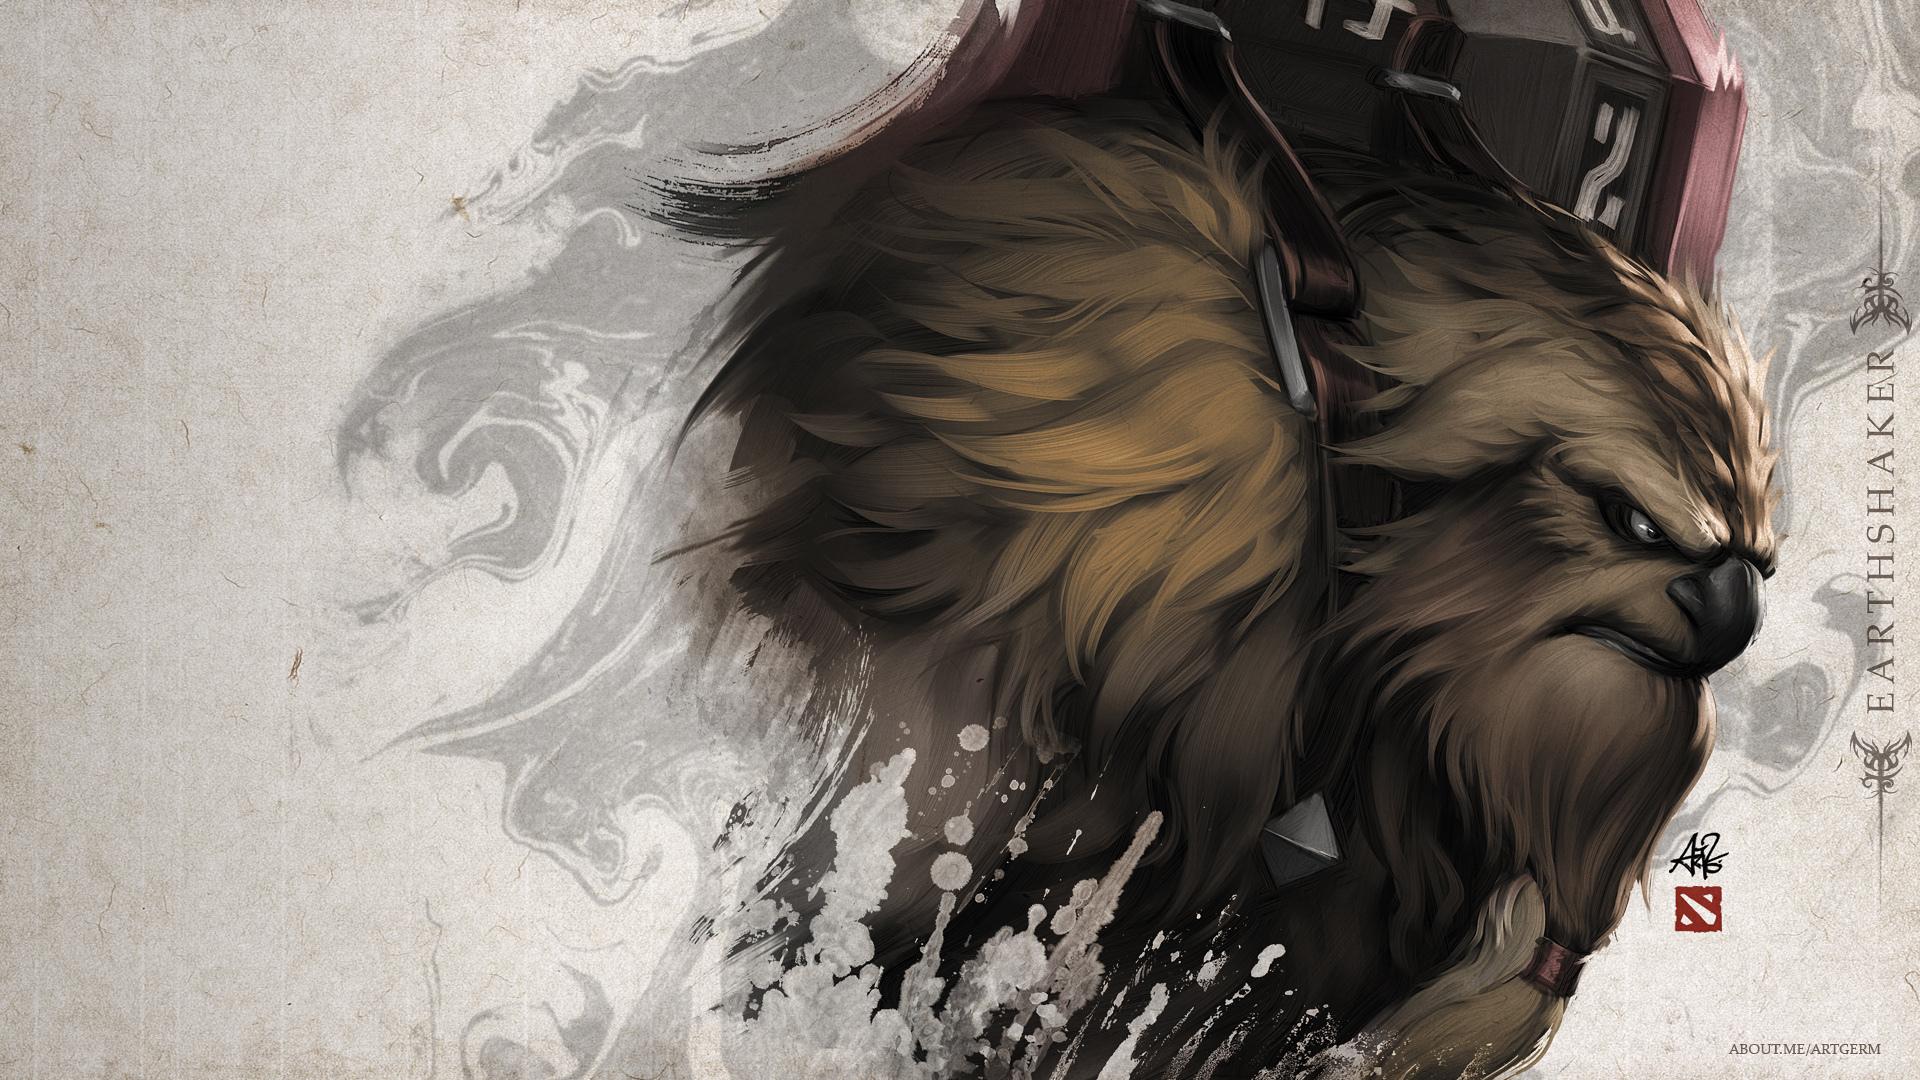 Phantom Assassin By Stanley Artgerm Lau DotA2